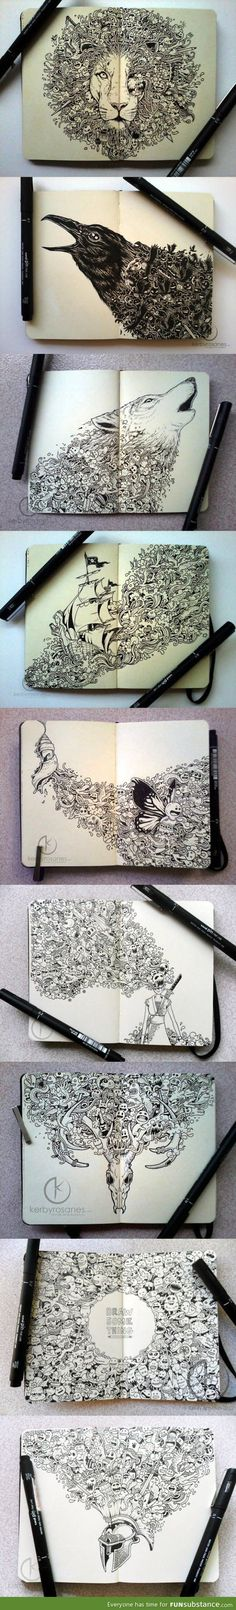 Incredible moleskine drawings